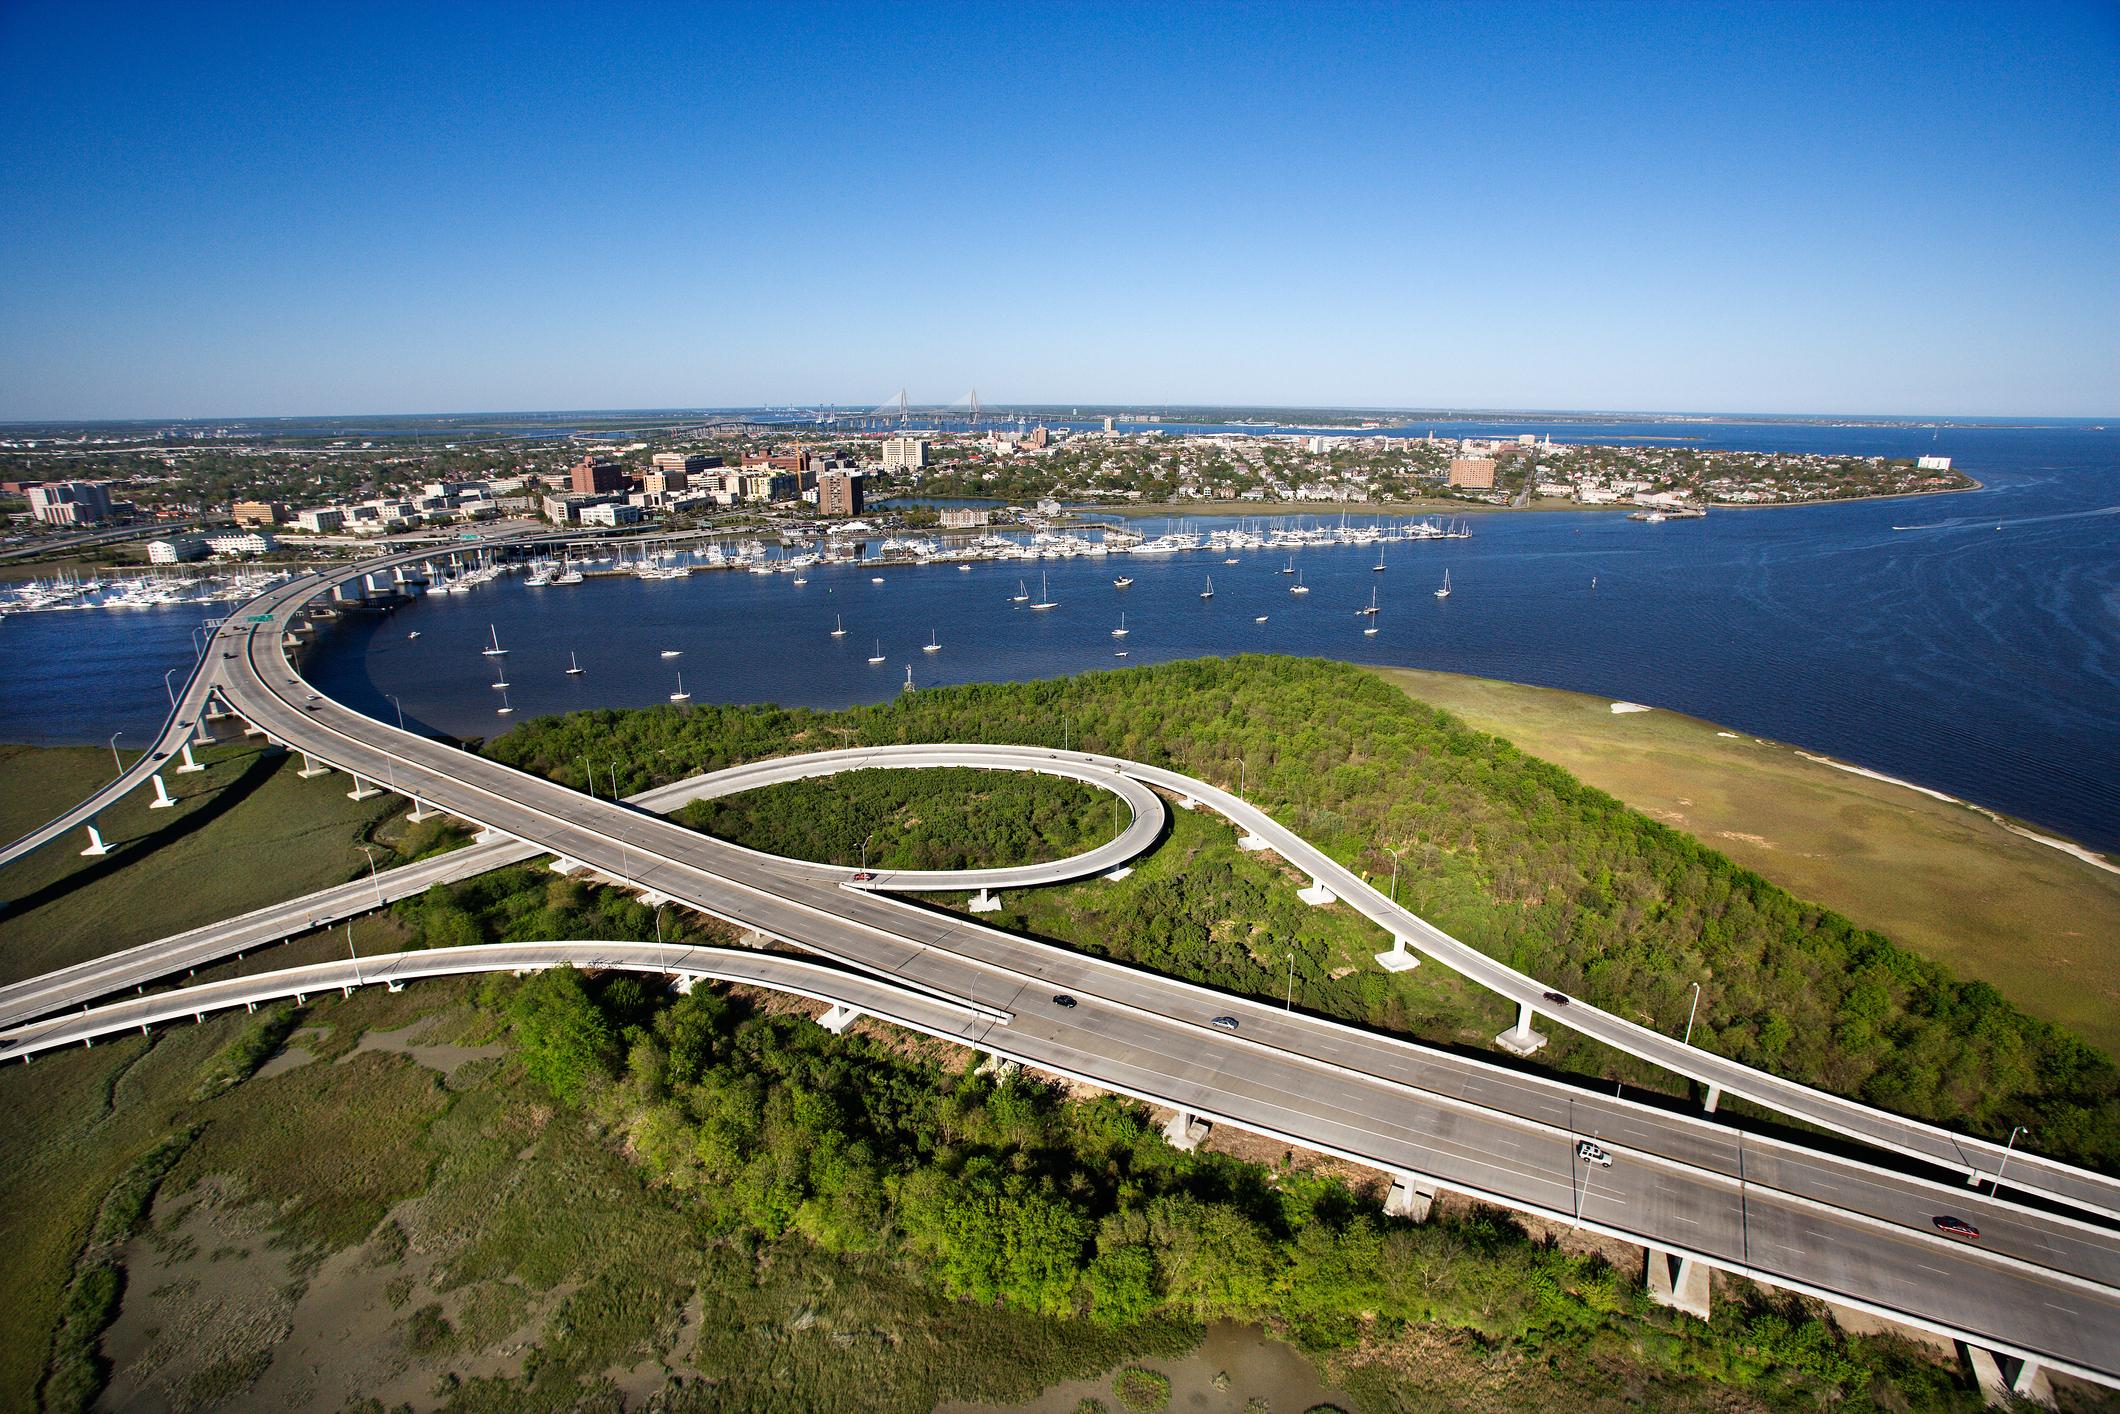 FITSNews – South Carolina Roads Get A Better Report Card